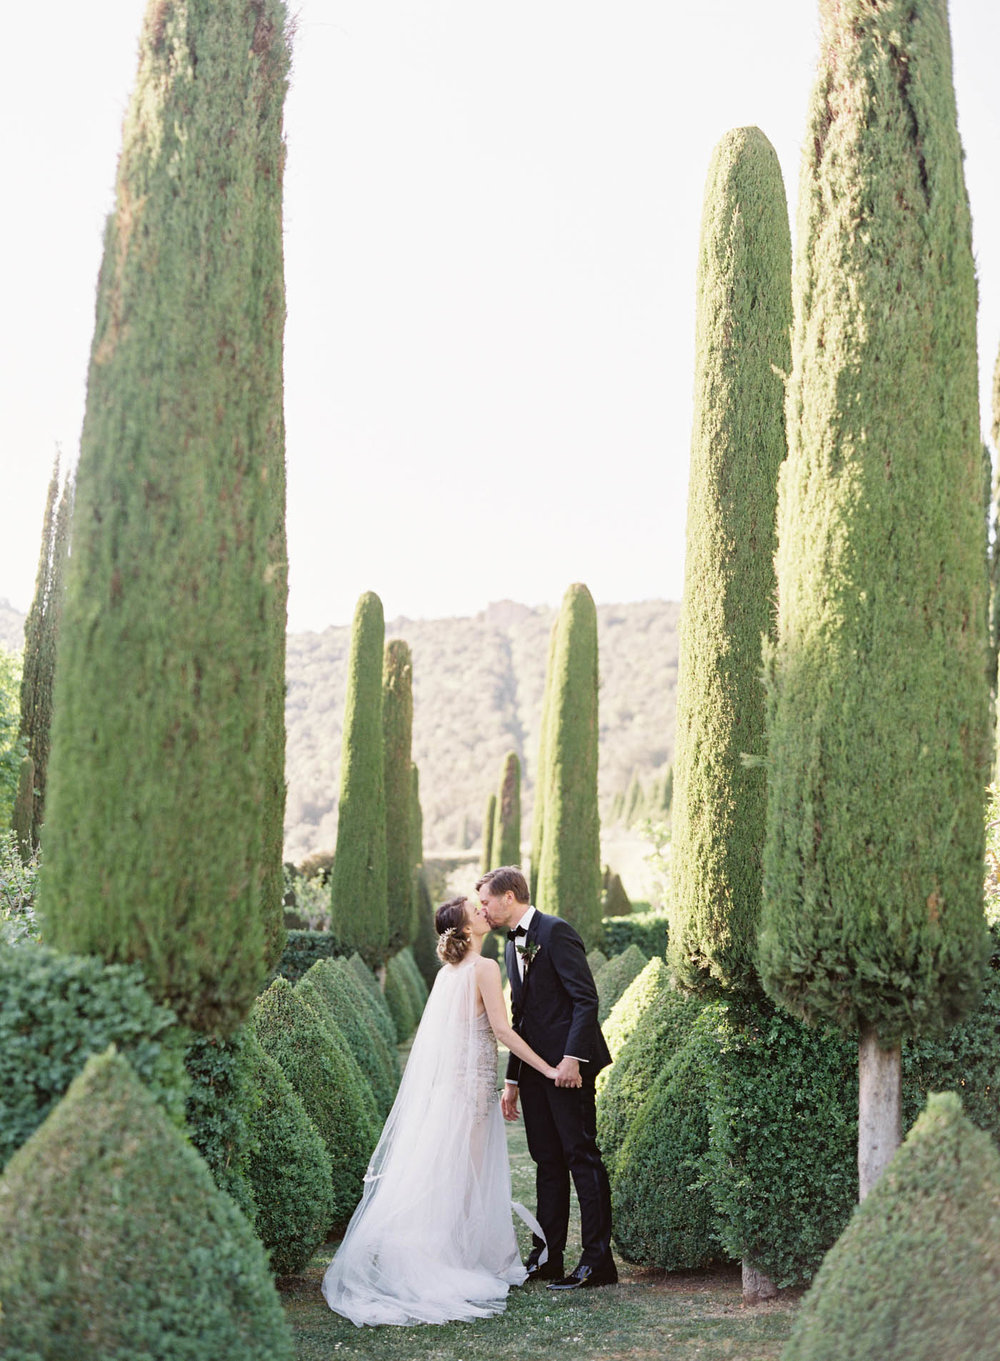 Villa_Cetinale_Wedding-40-Jen_Huang-ElanJacob-256-Jen_Huang-007316-R1-006.jpg